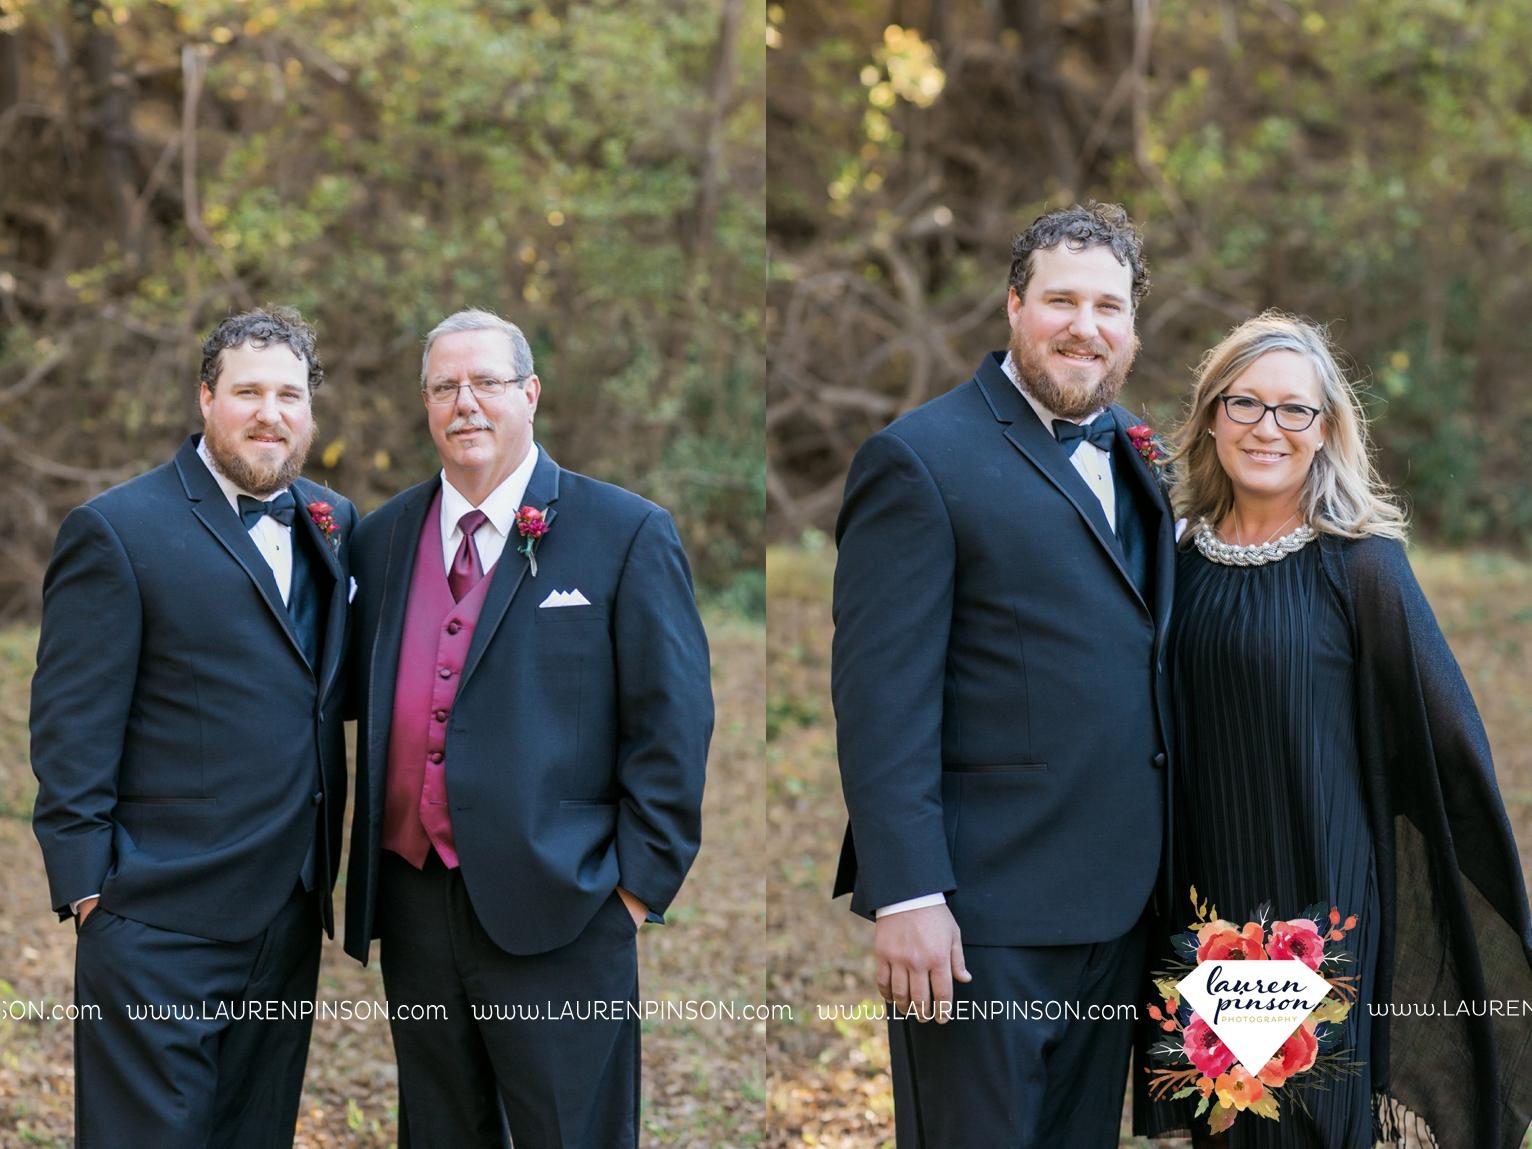 rustic-wichita-falls-texas-wedding-photographer-gold-glam-mayfield-events-market-street-united-allue-bridals-fall_1742.jpg